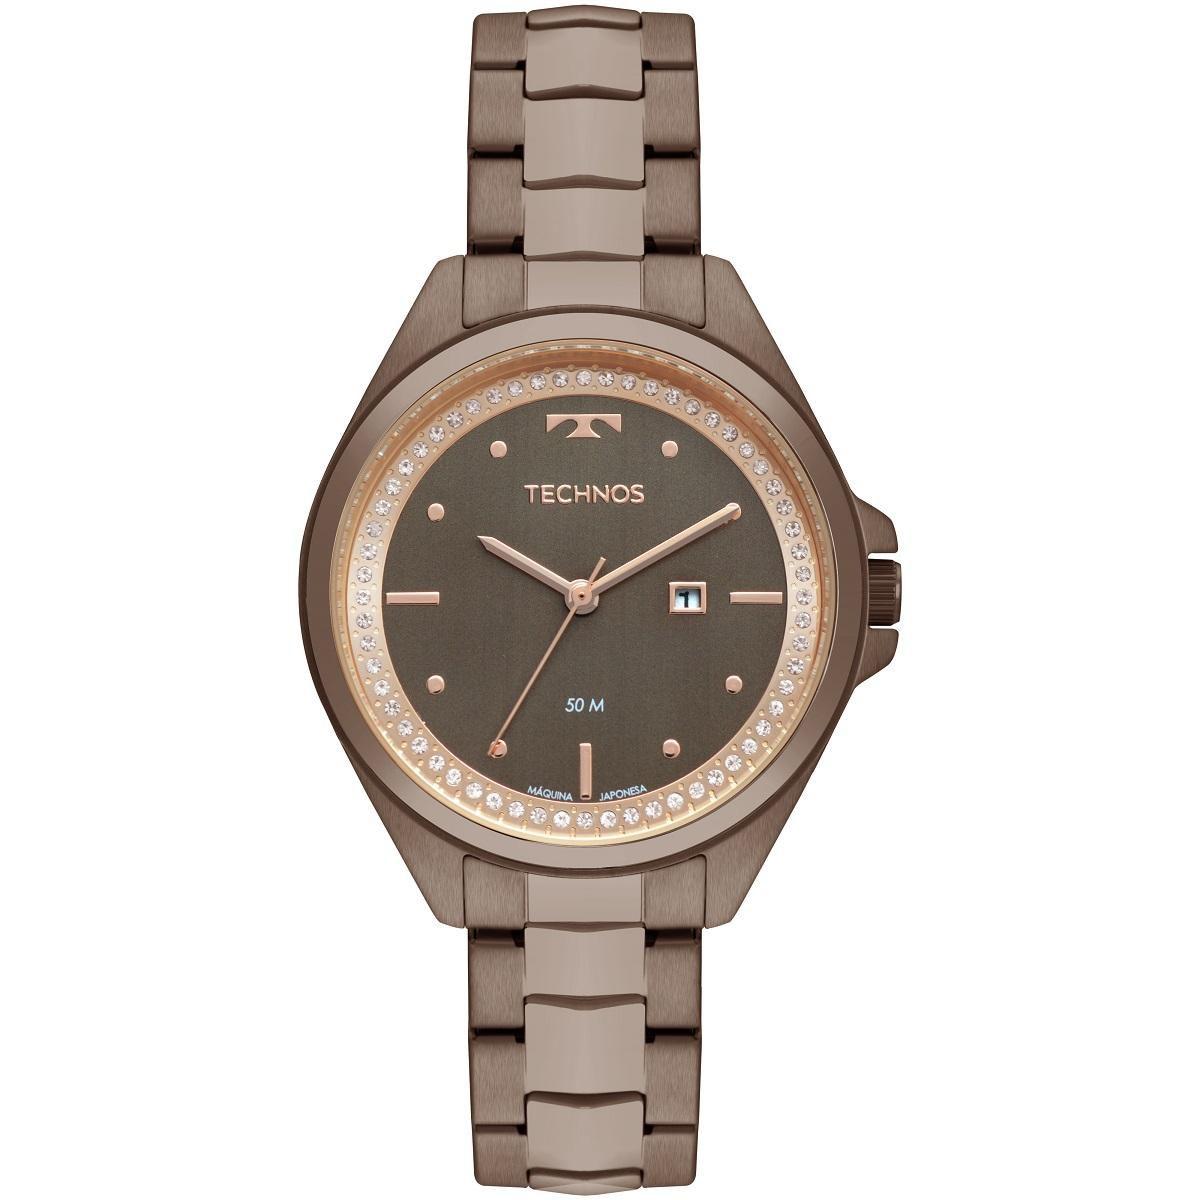 Relógio Feminino Technos Trend 2015CBY/4M 38mm Aço Marrom